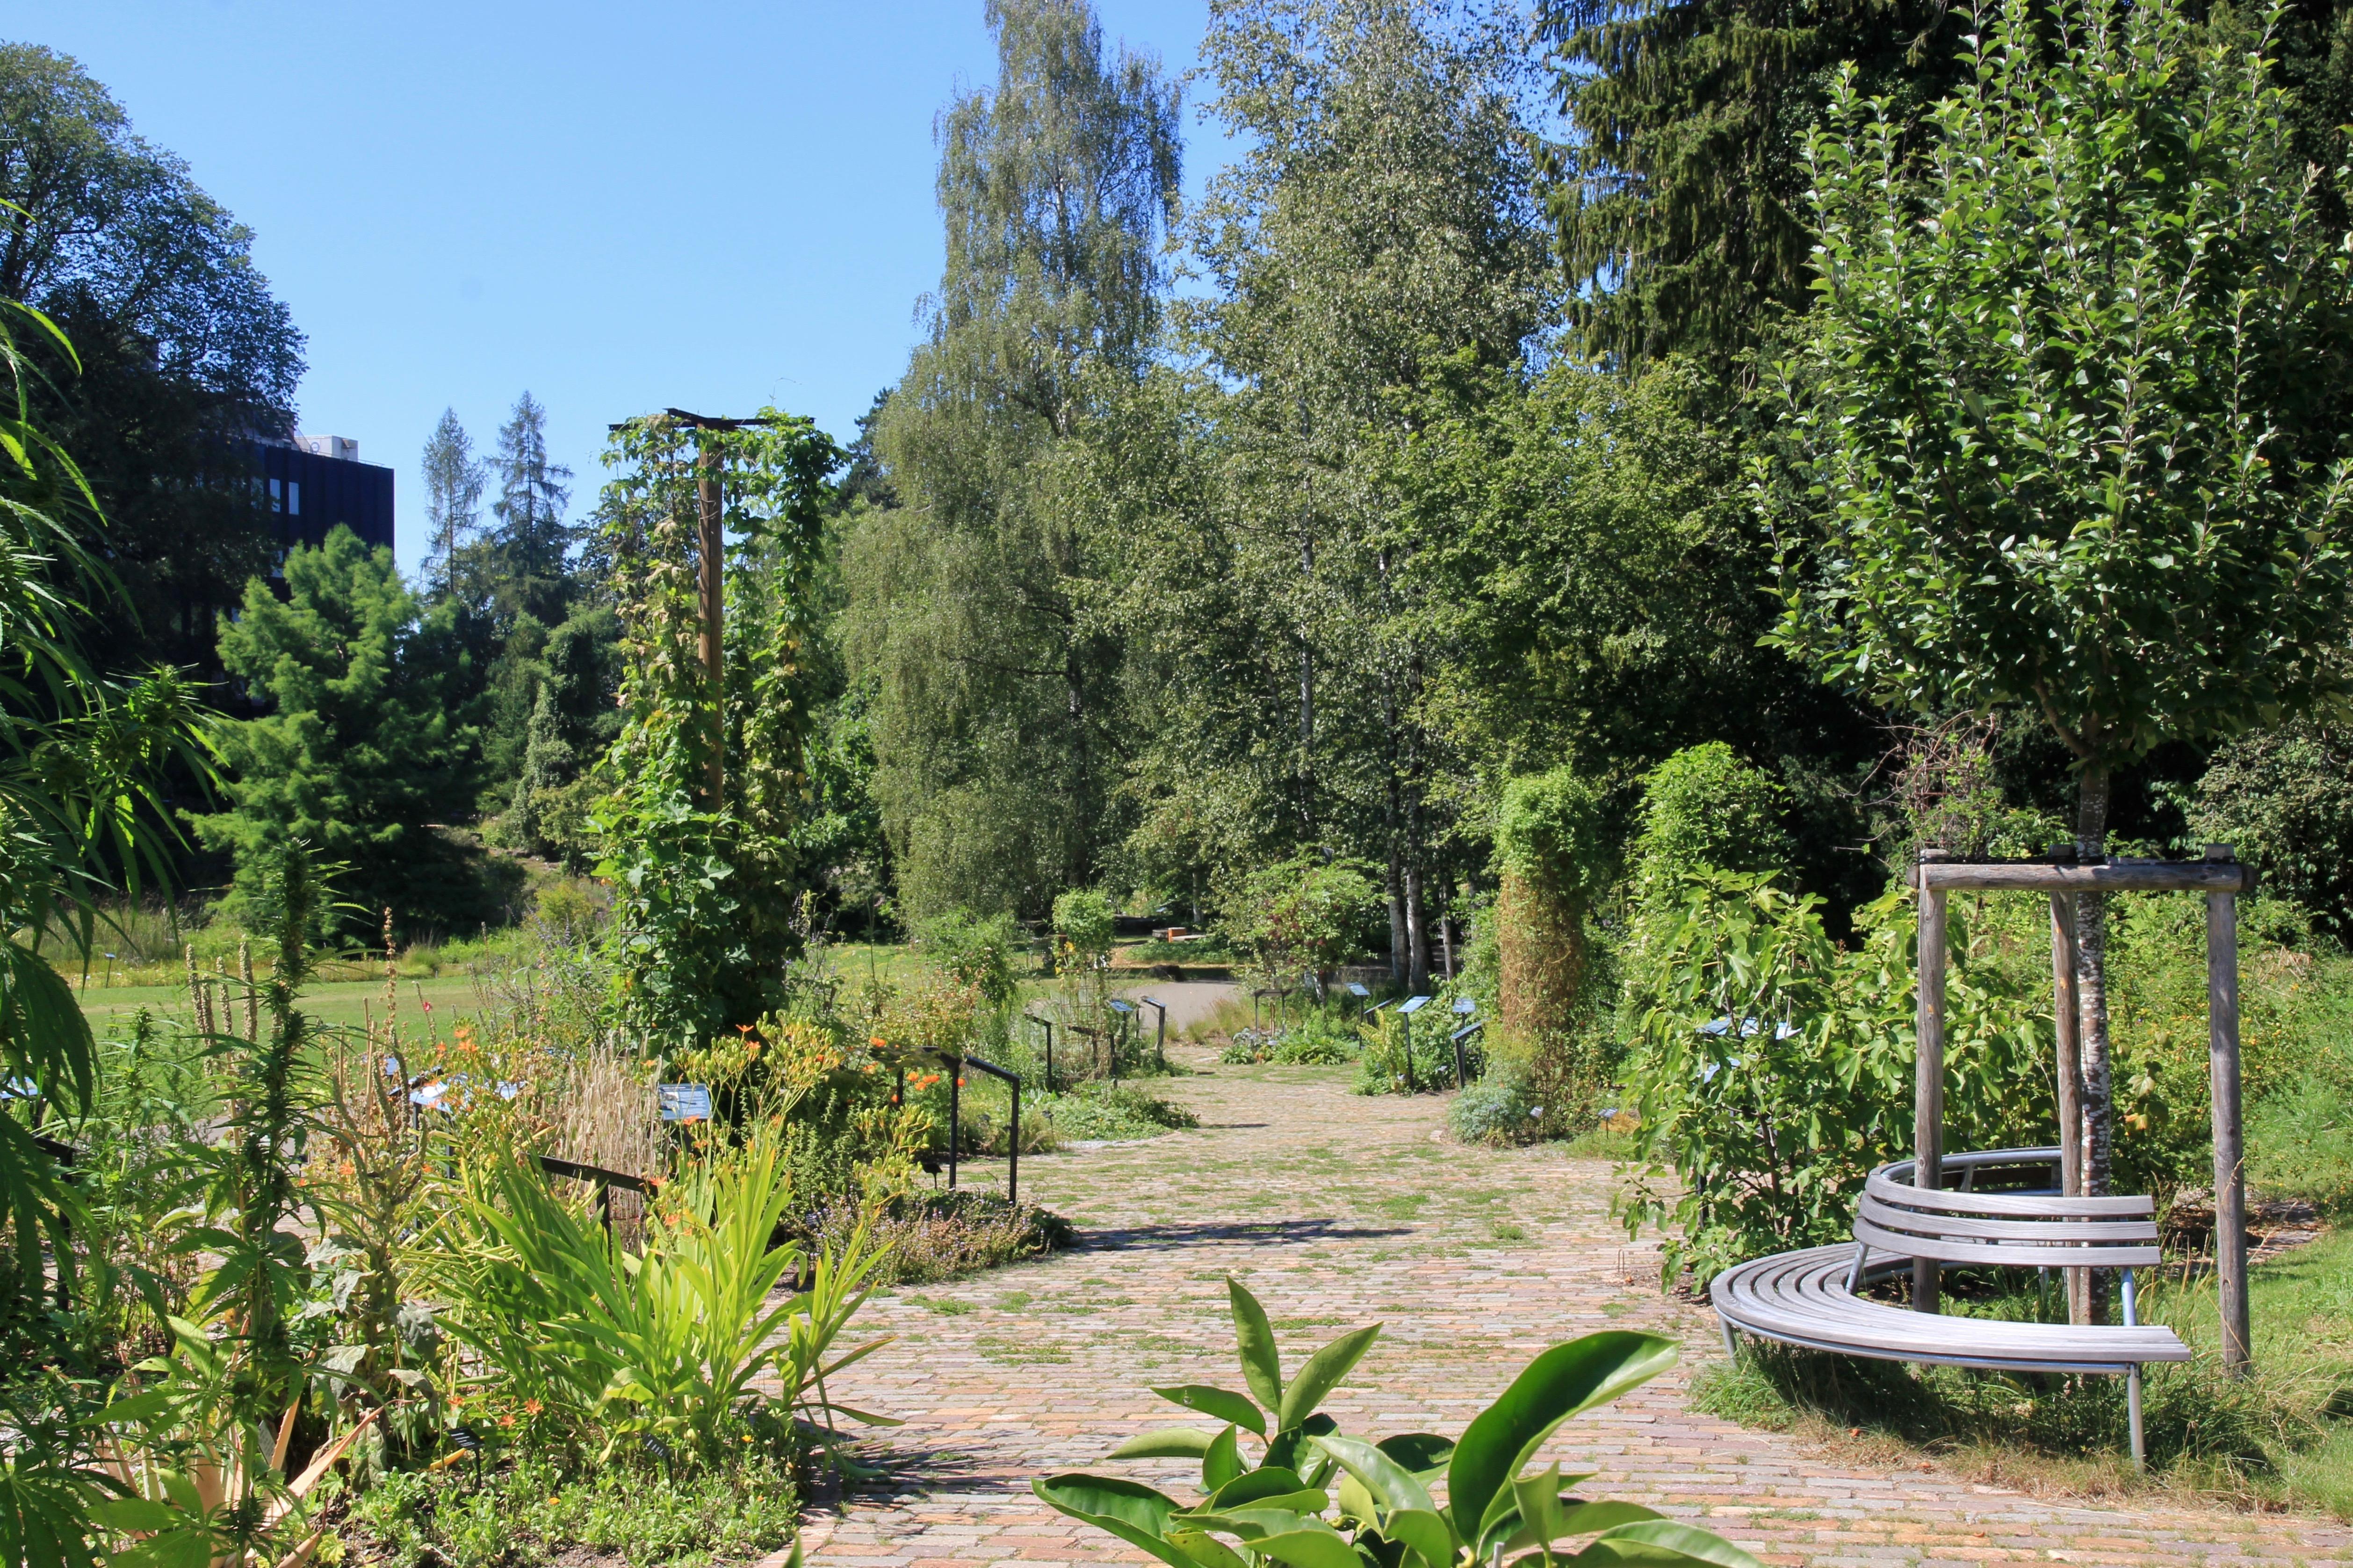 Giardino botanico di Zurigo